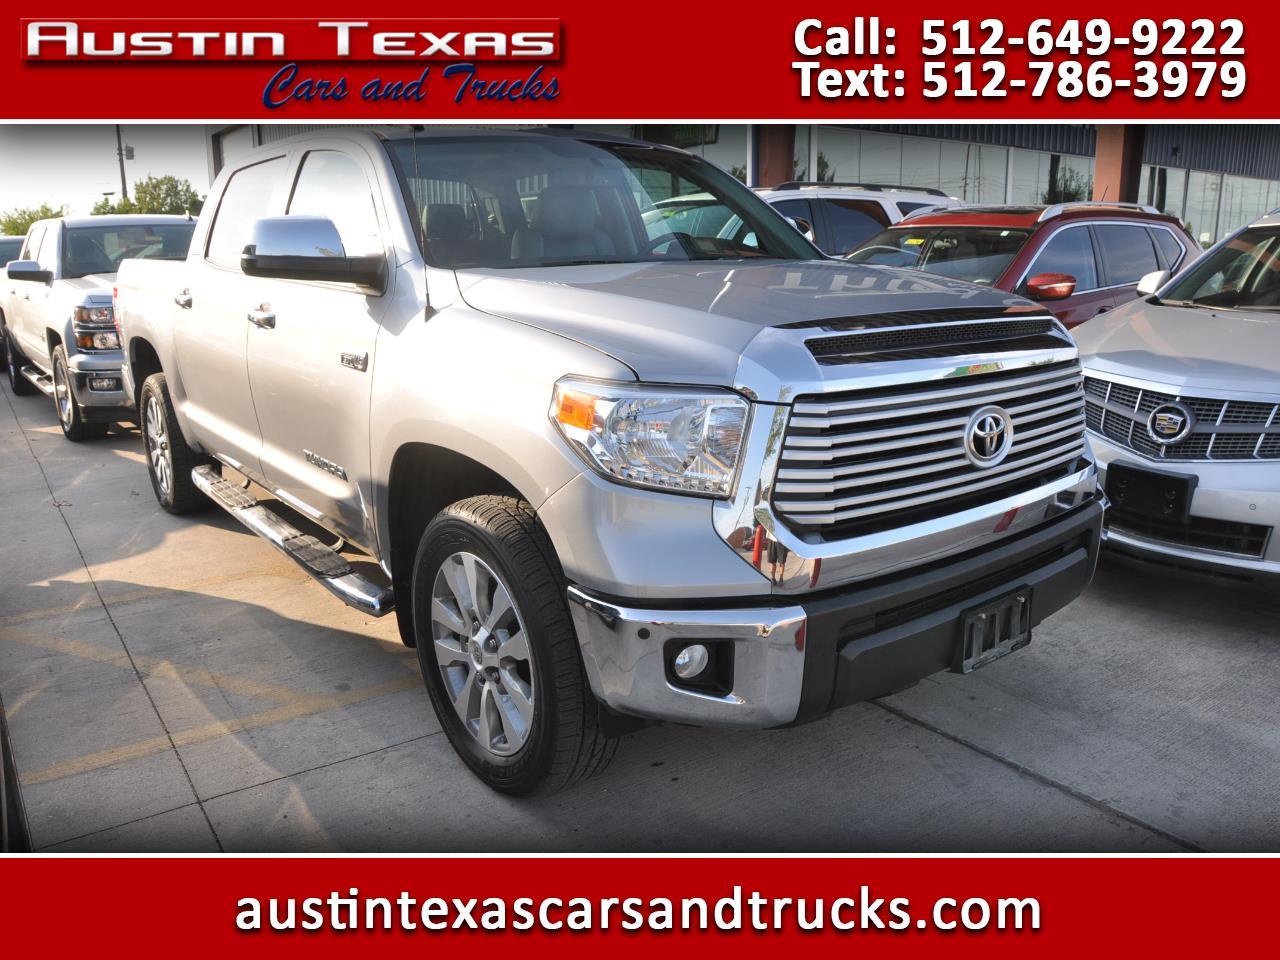 Used Cars for Sale Austin TX 78731 Austin Texas Cars And Trucks